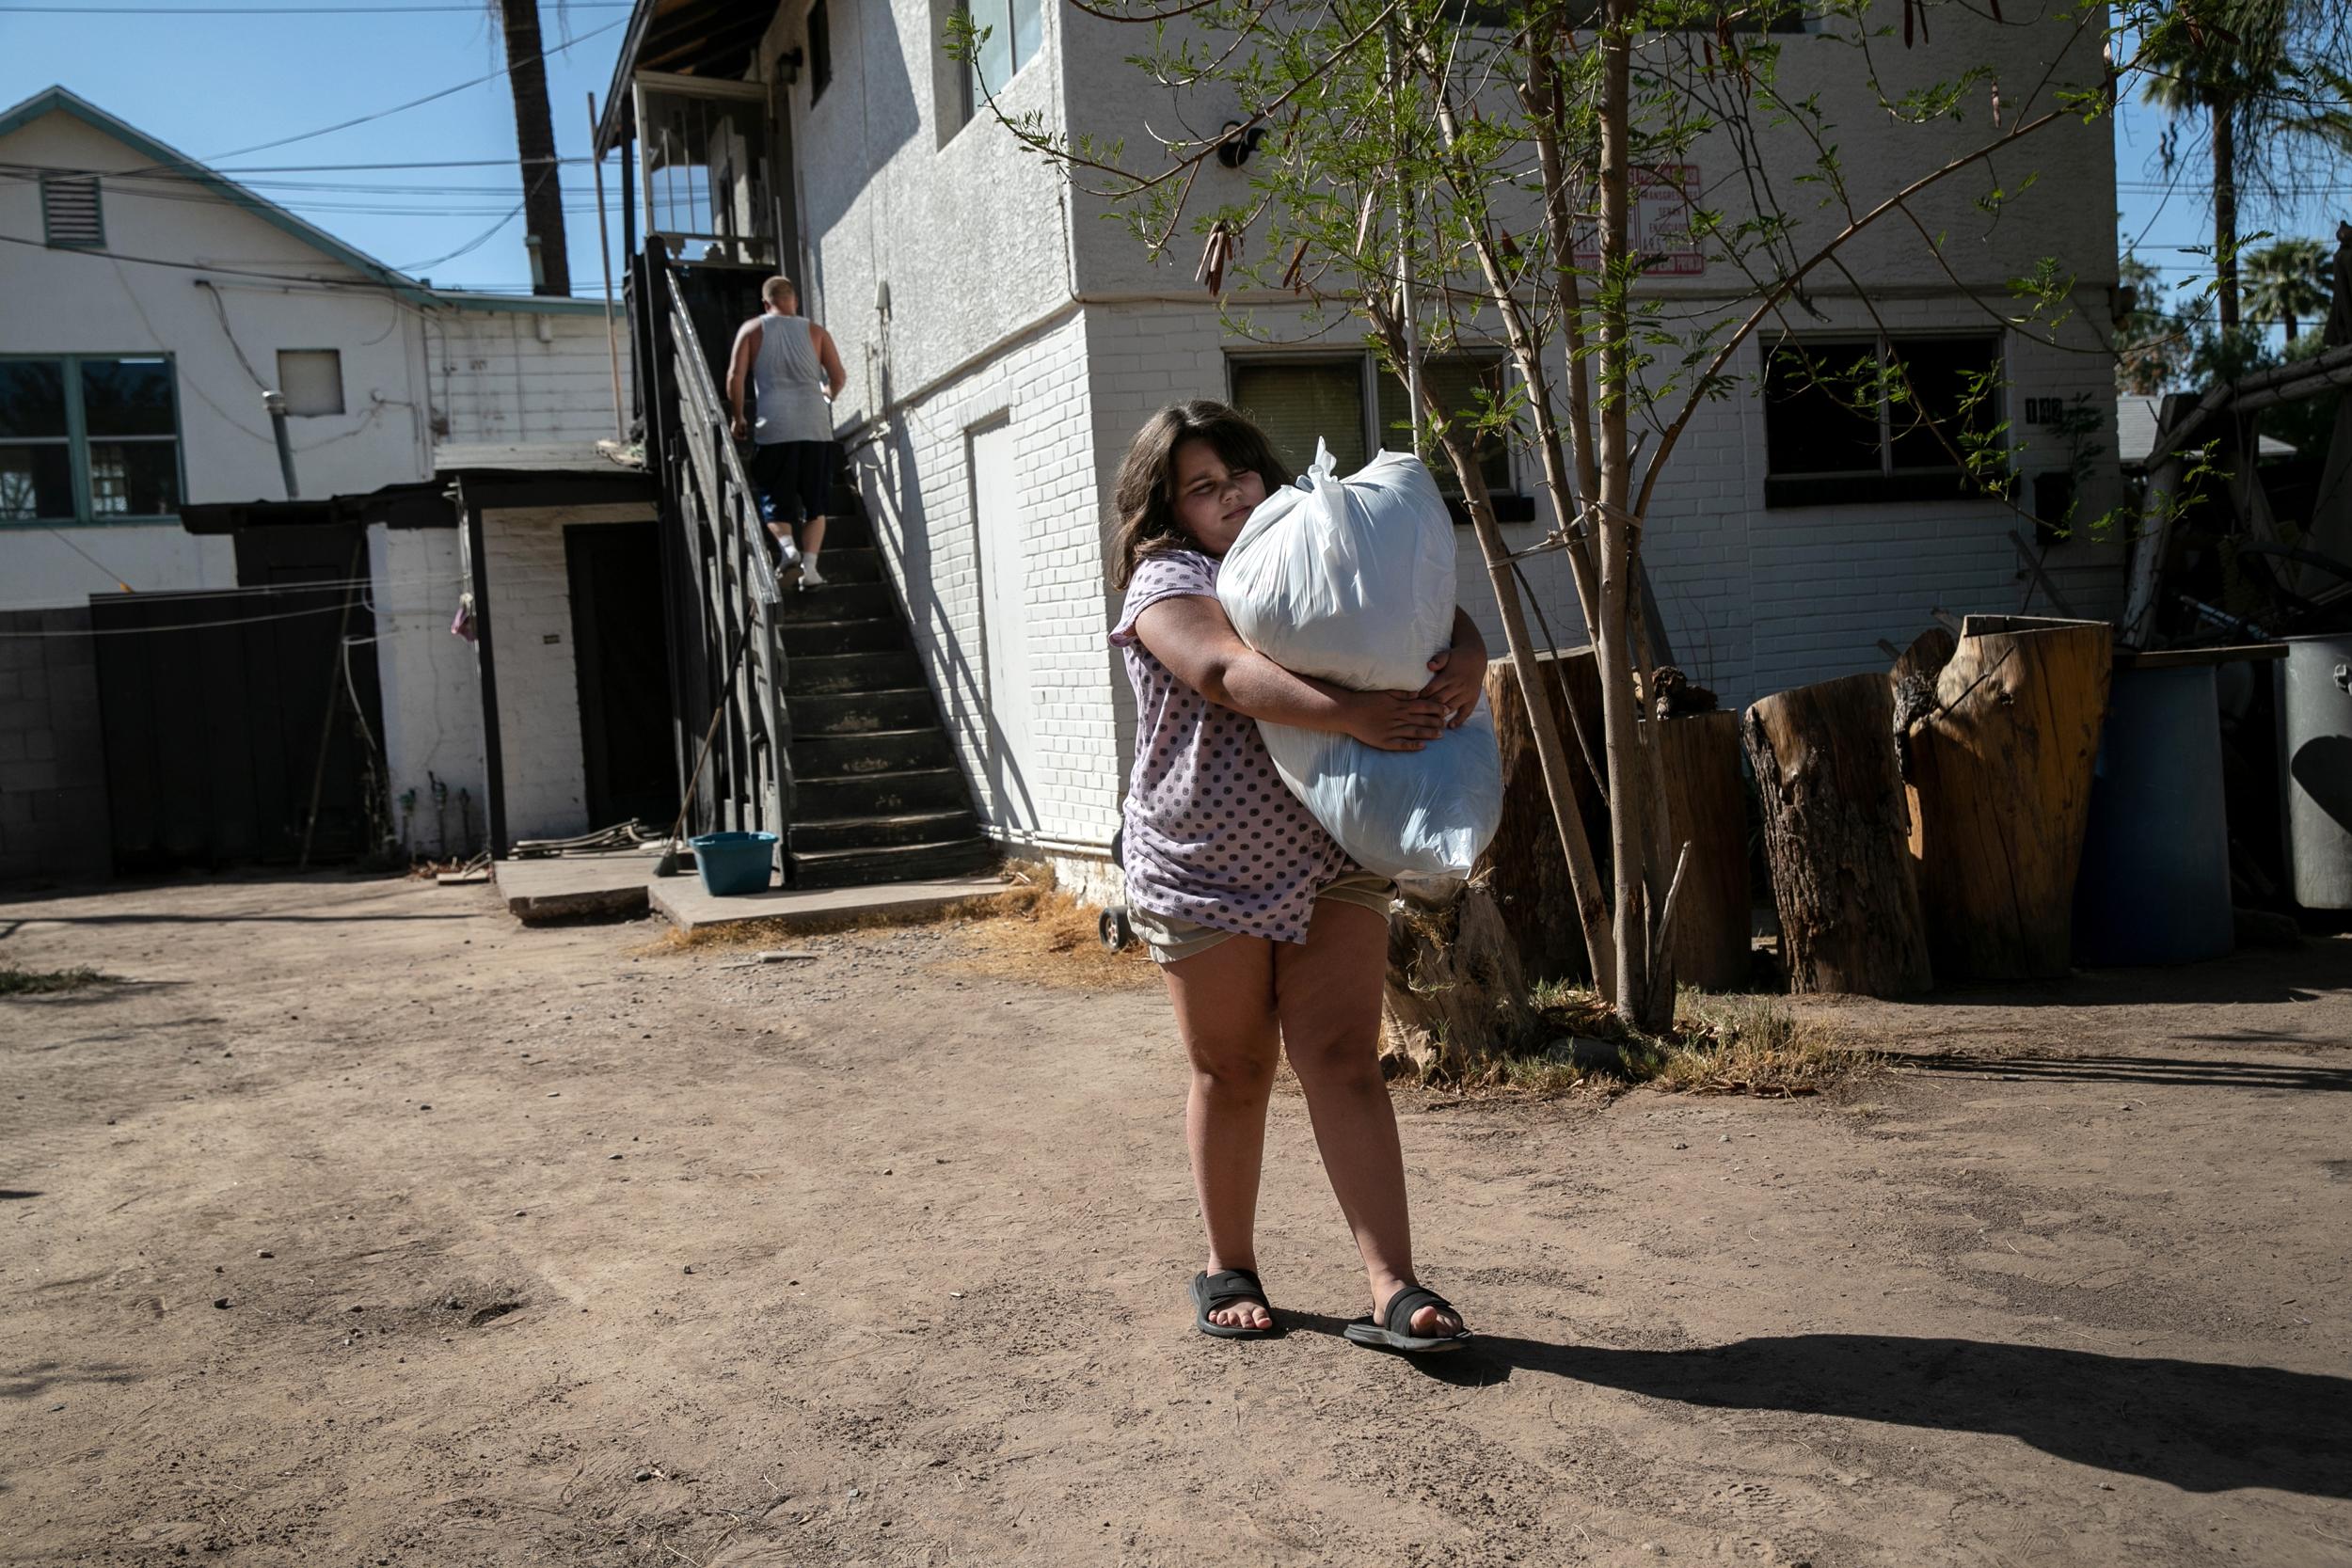 Federal judge skeptical new eviction moratorium can survive legal challenge